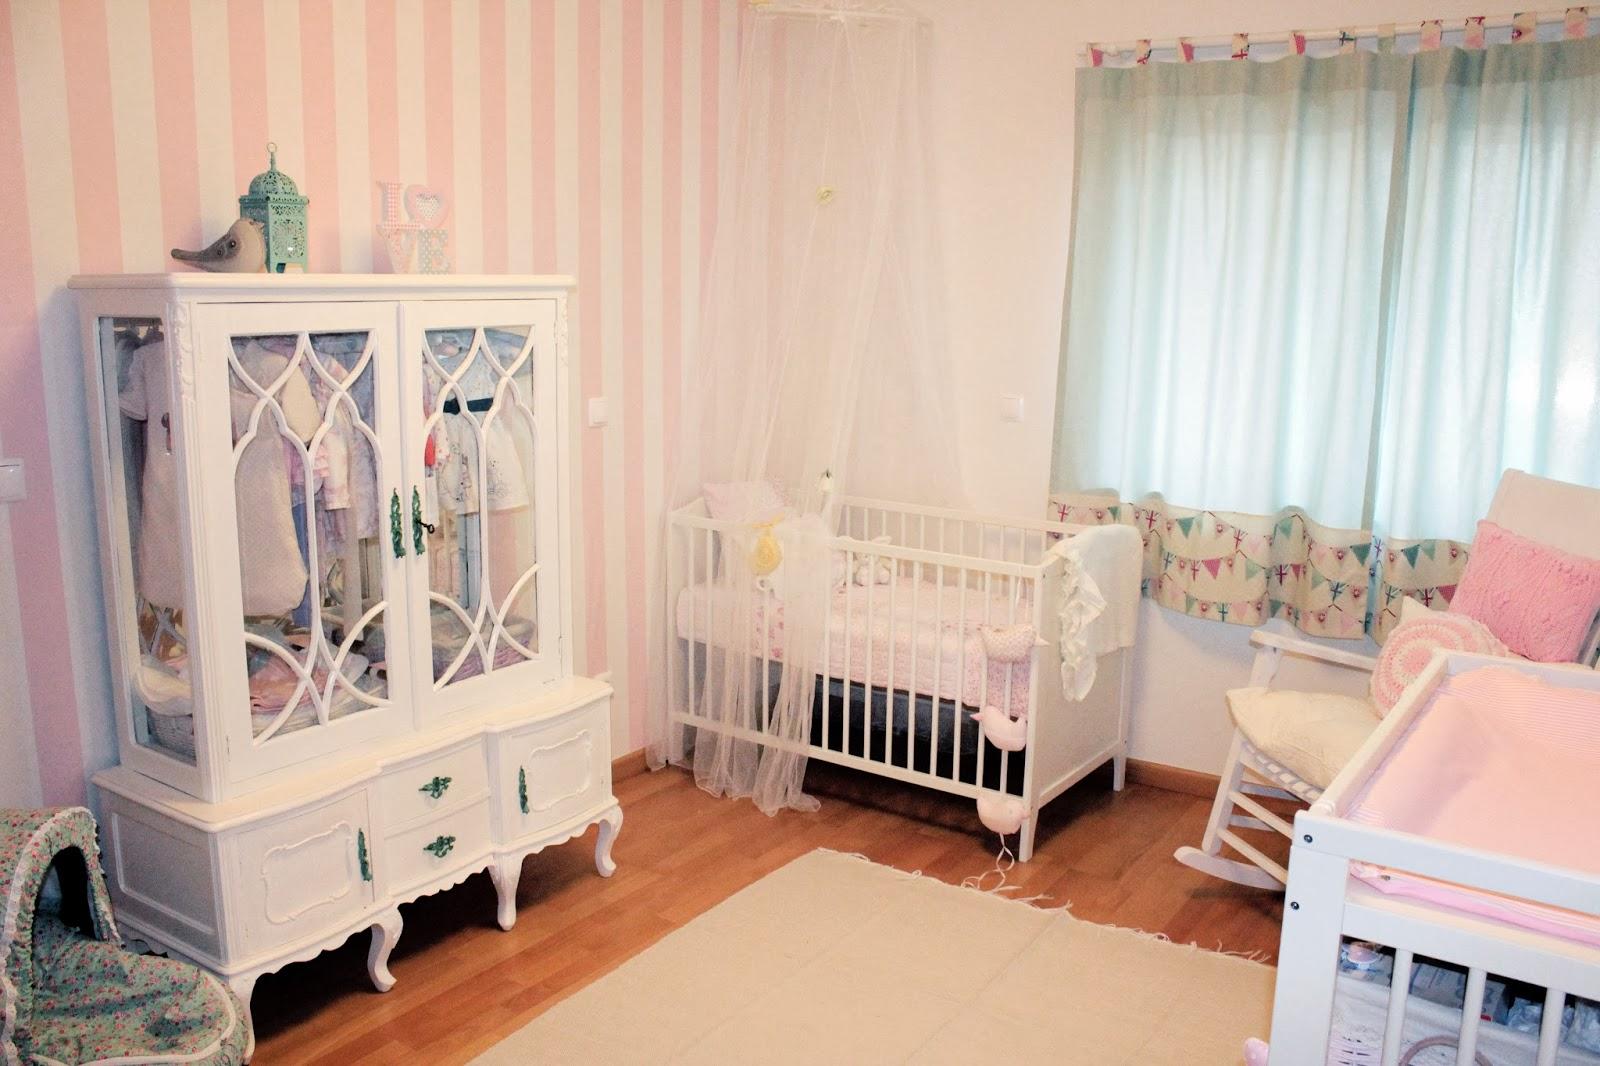 A m e que sabe lista de essenciais para o beb e para n s - Camas de bebe ikea ...